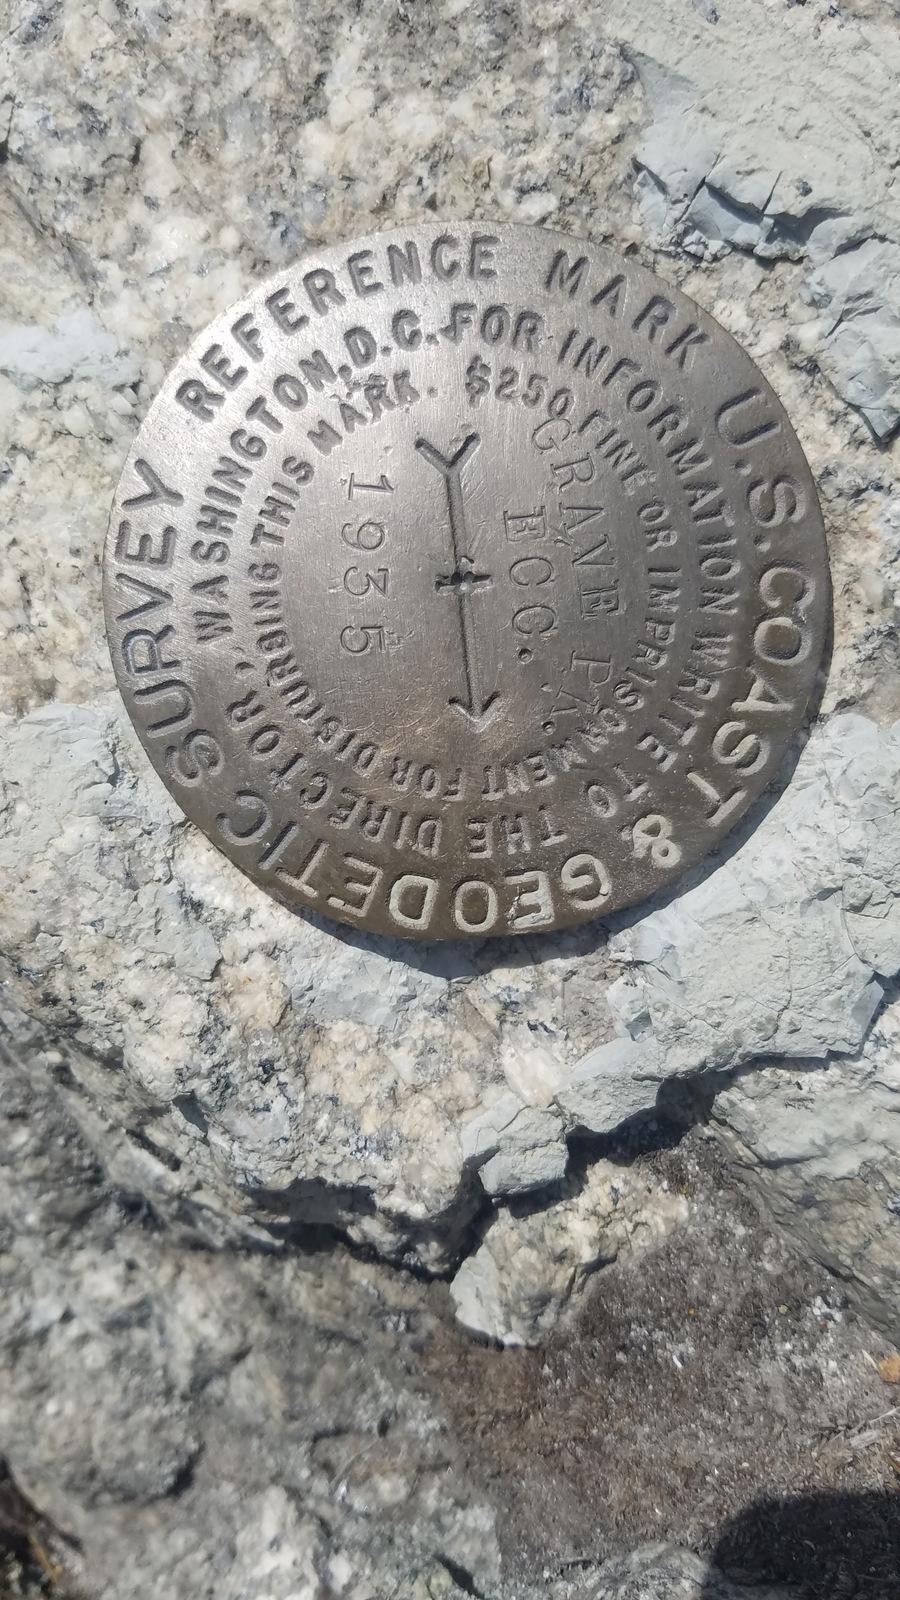 8282' Graves Peak